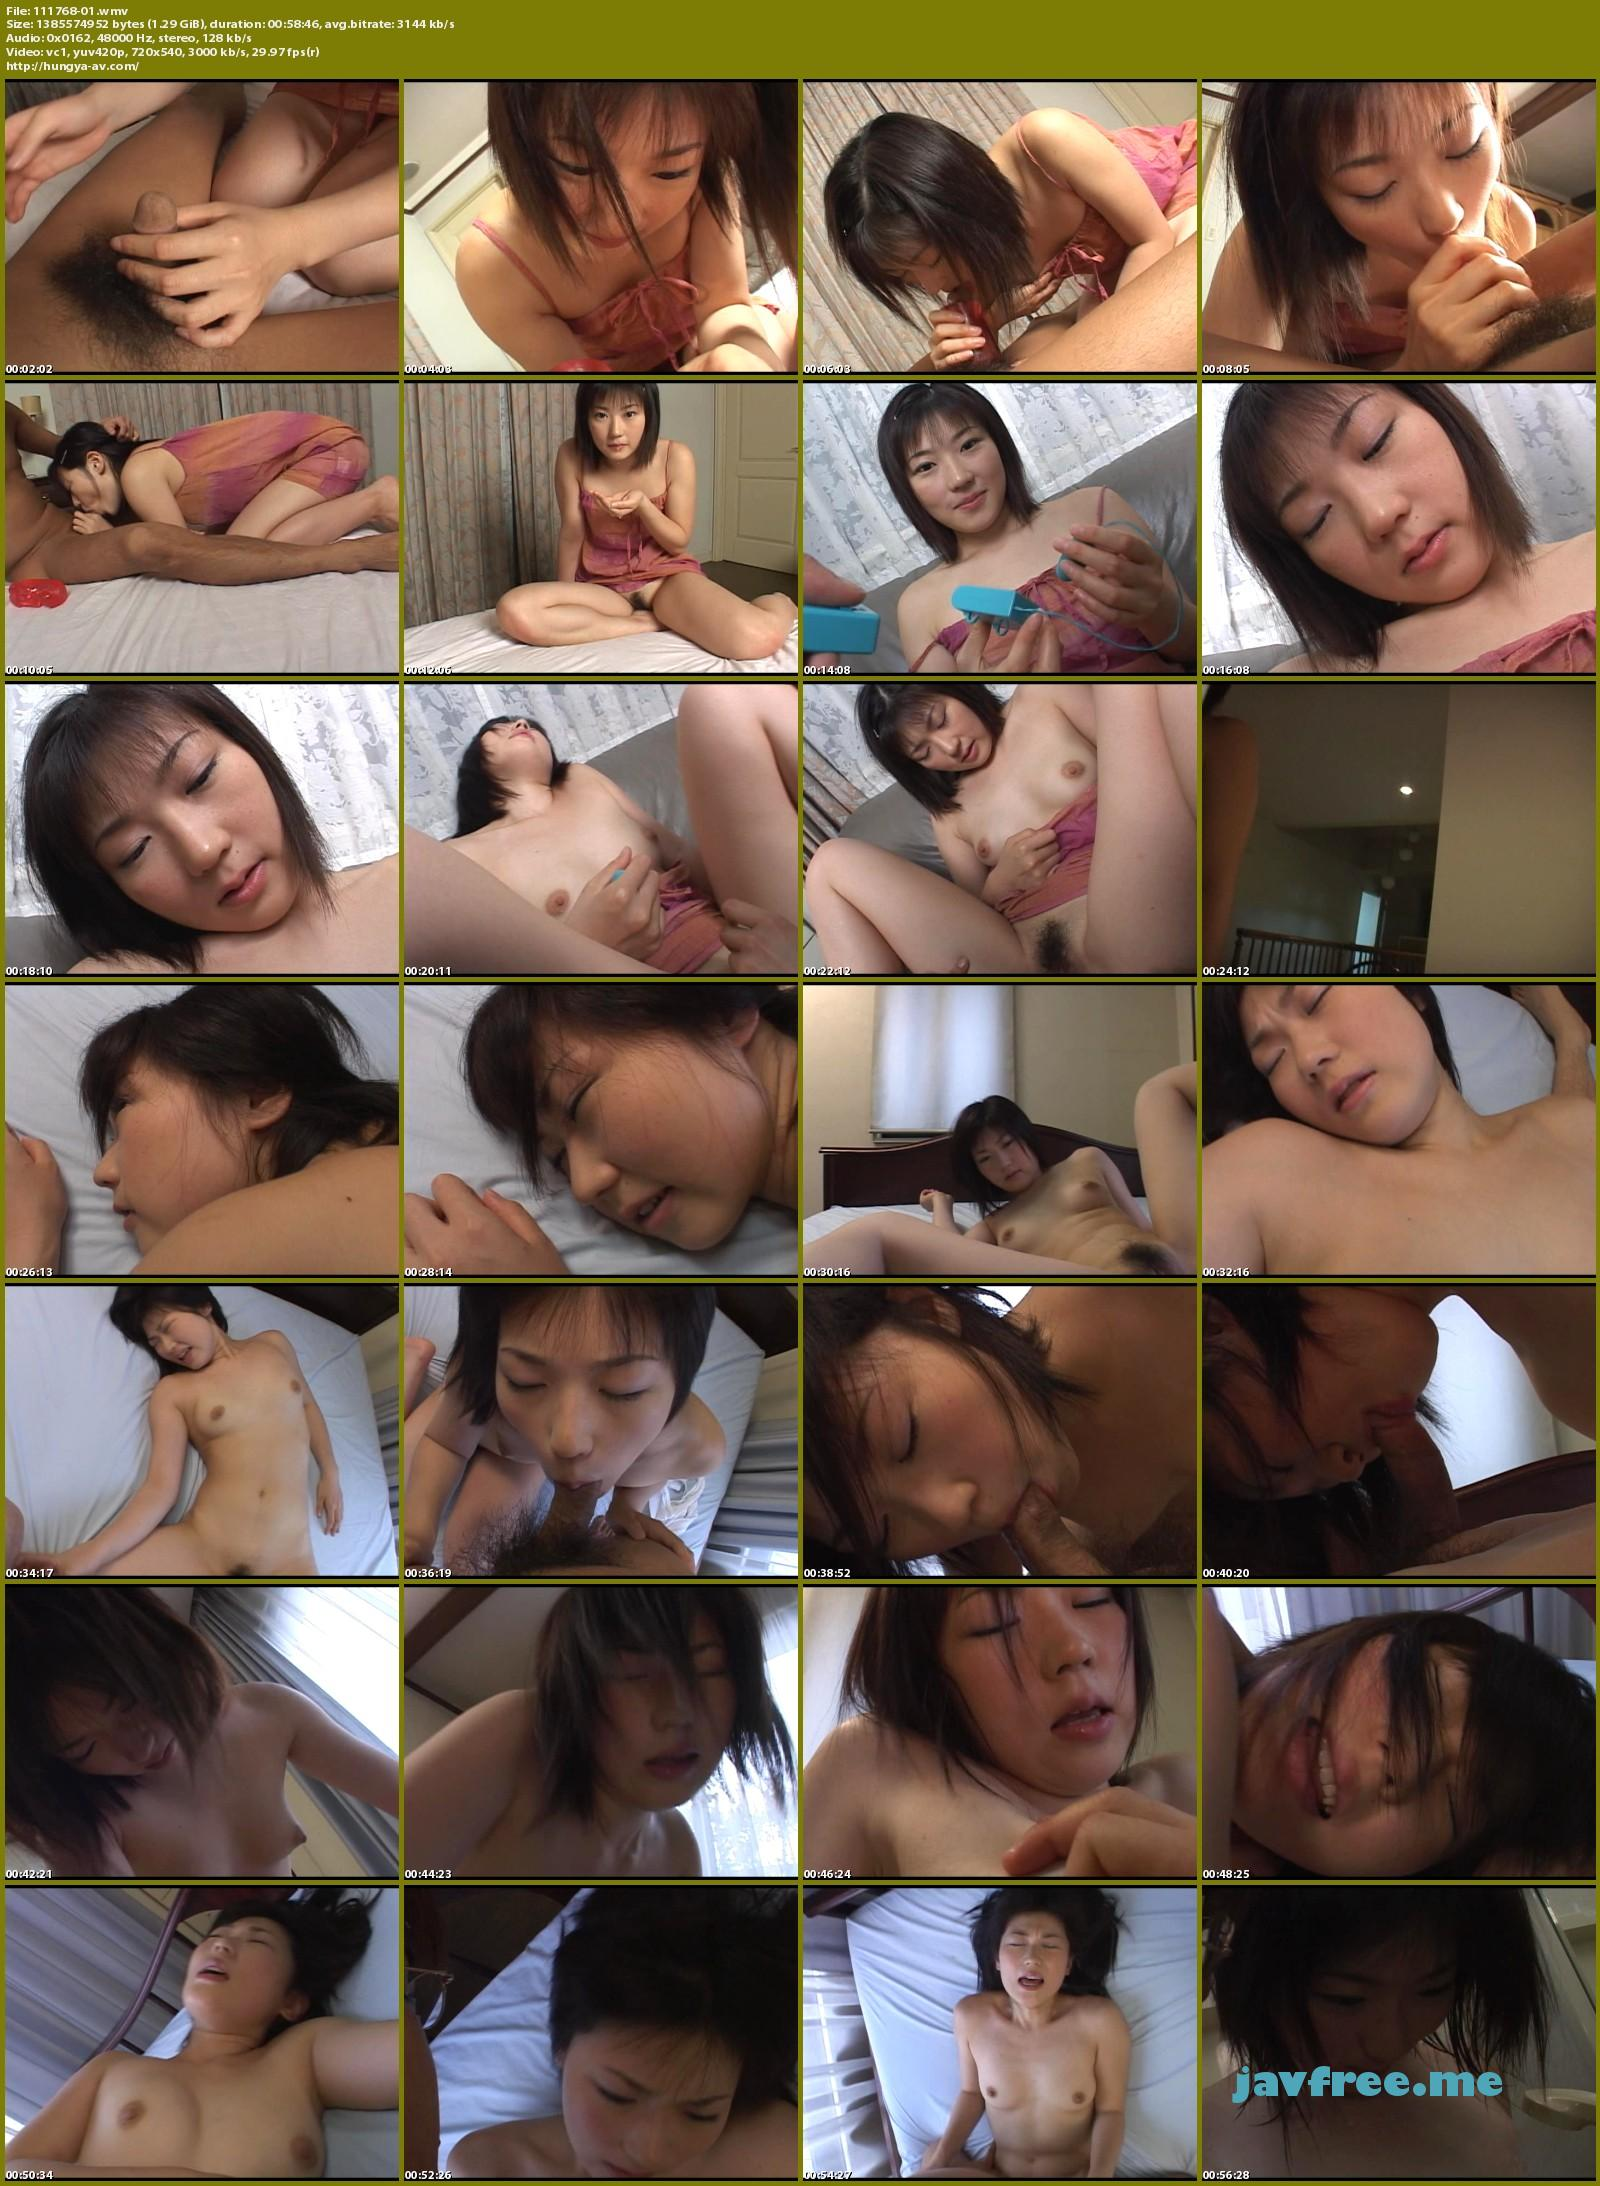 X1X 111768 Love Collection 笠木忍 kasagishinobu 笠木忍 x1x kasagishinobu